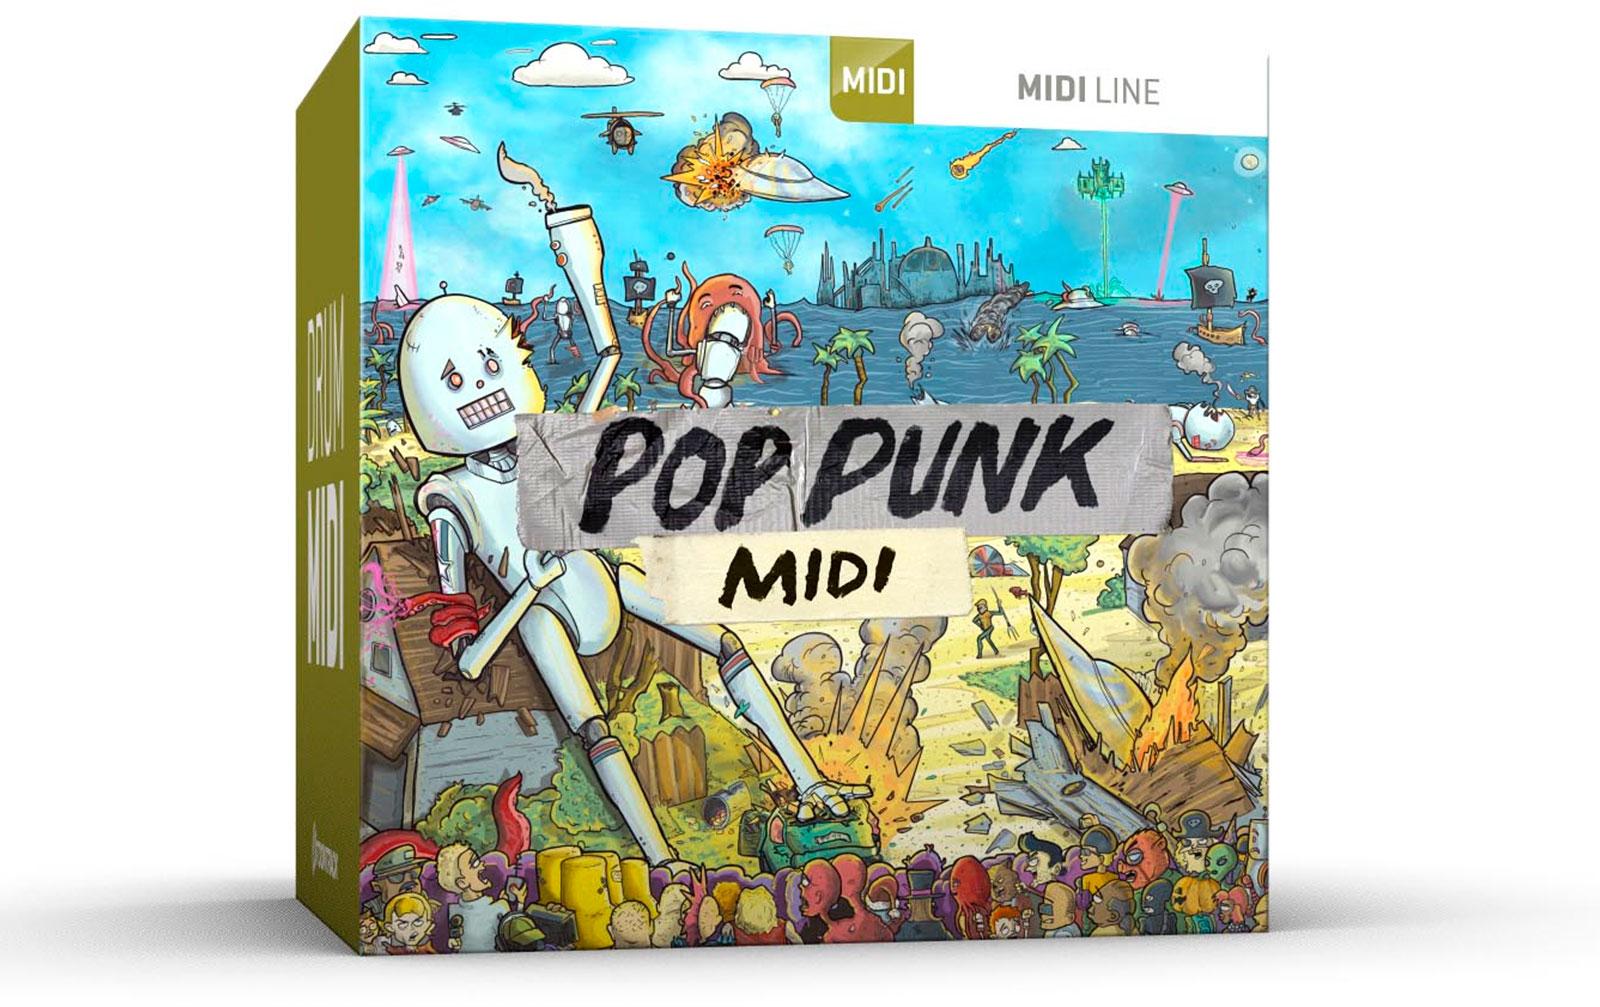 toontrack-pop-punk-midi-pack-download-